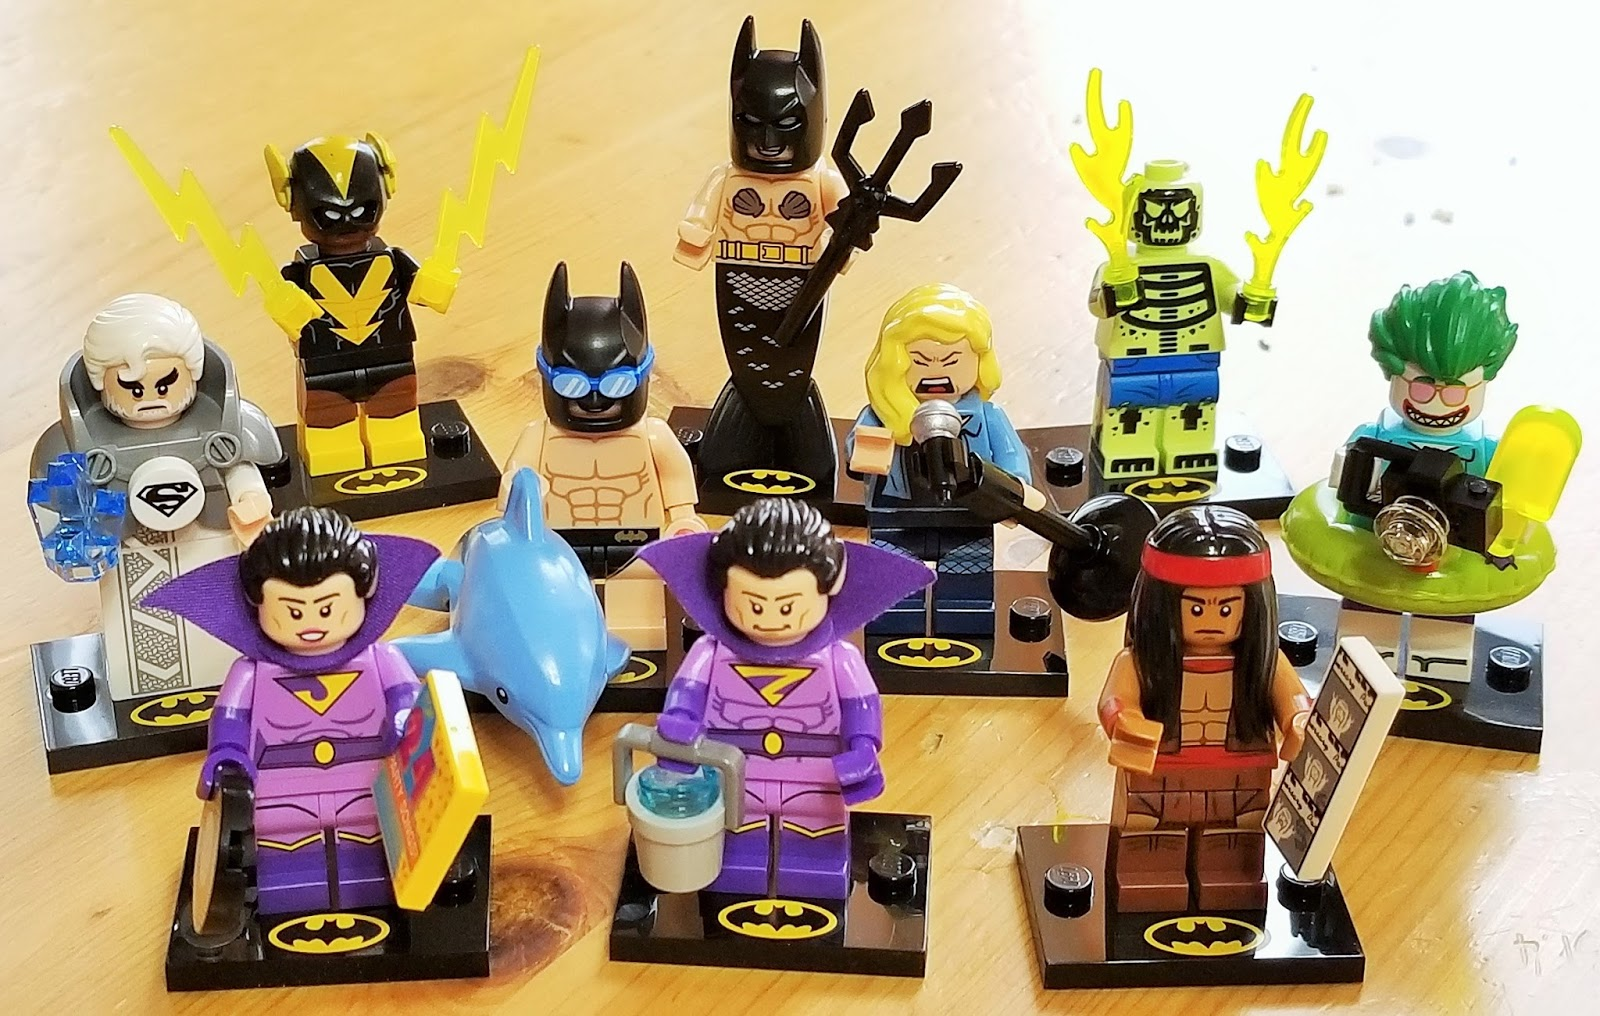 WONDER TWIN ZAN TILE X 1,PARTS New LEGO MINIFIGURES BATMAN SERIES 2